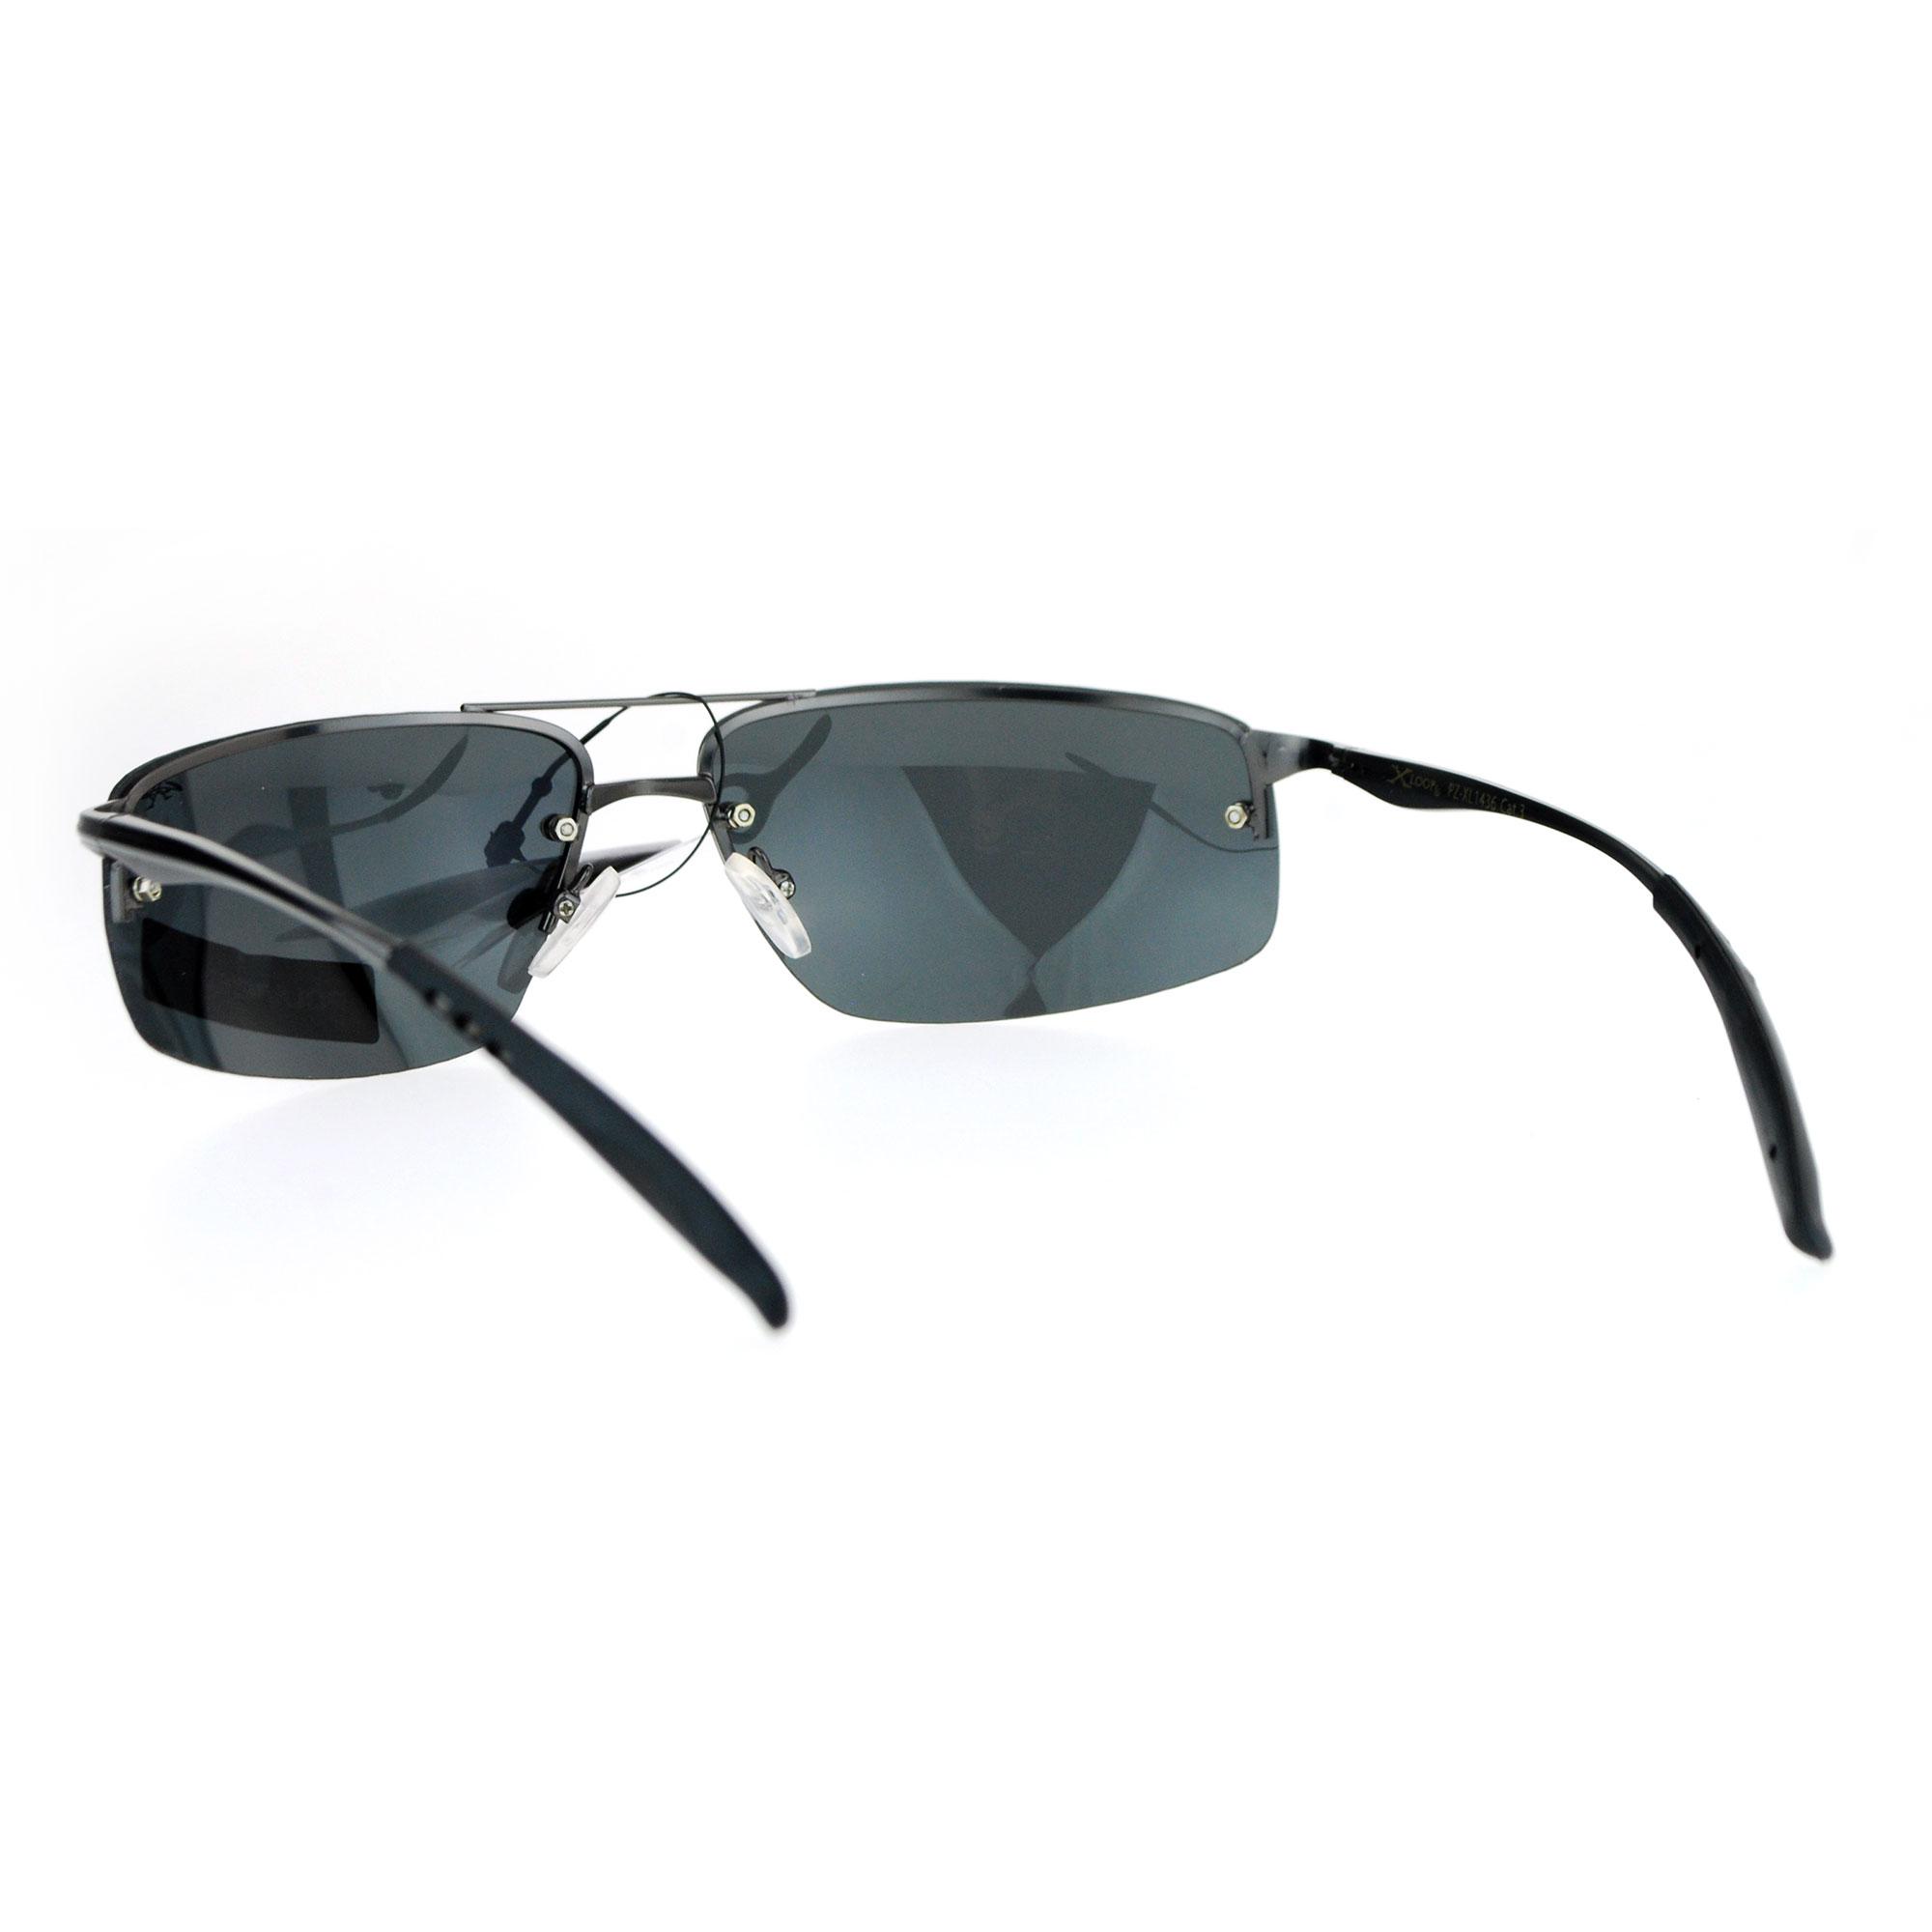 Rimless Polarized Sunglasses : Xloop Rimless Rectangular Polarized Lens Mens Sport ...